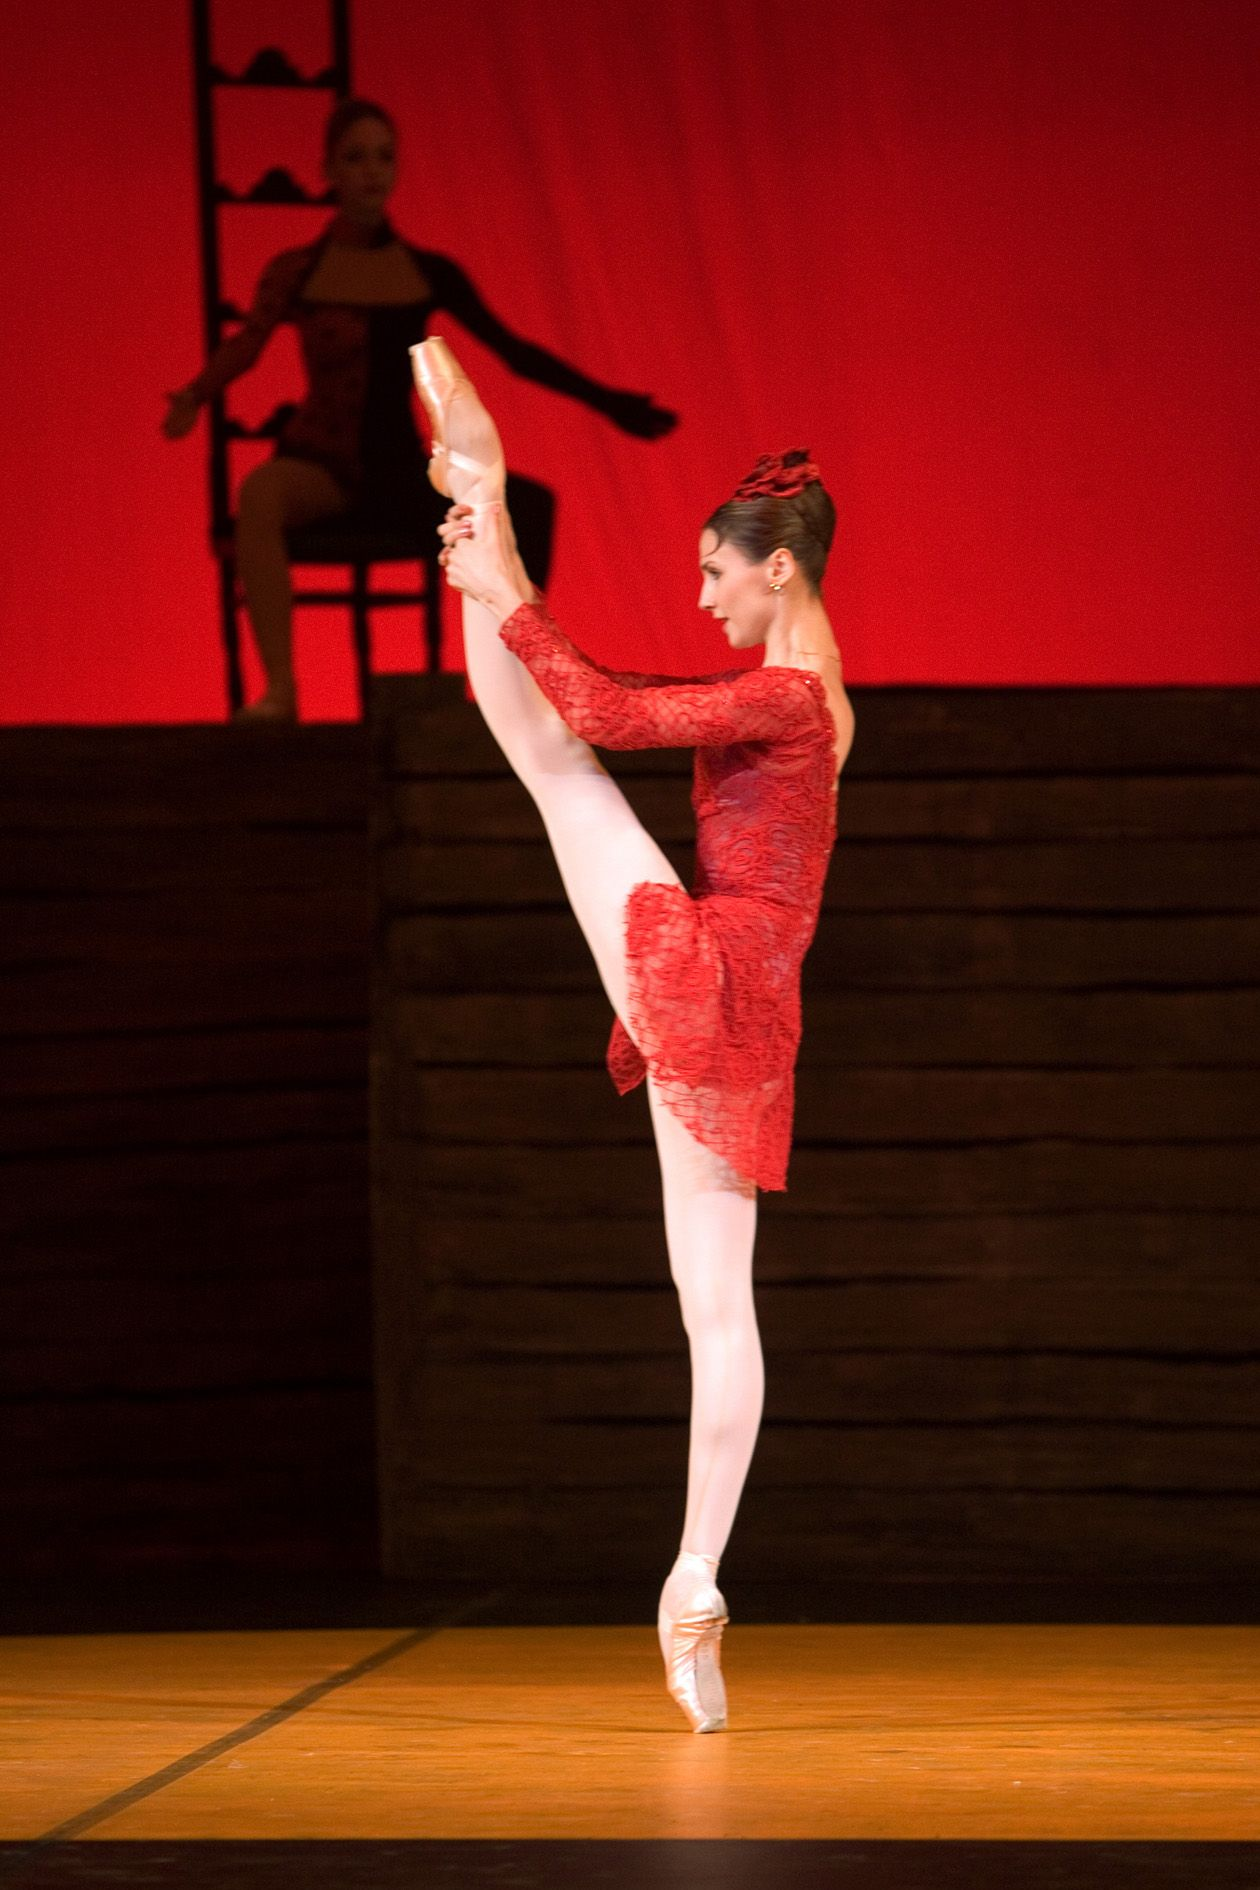 Resultado de imagem para Carmen ballet zakharova